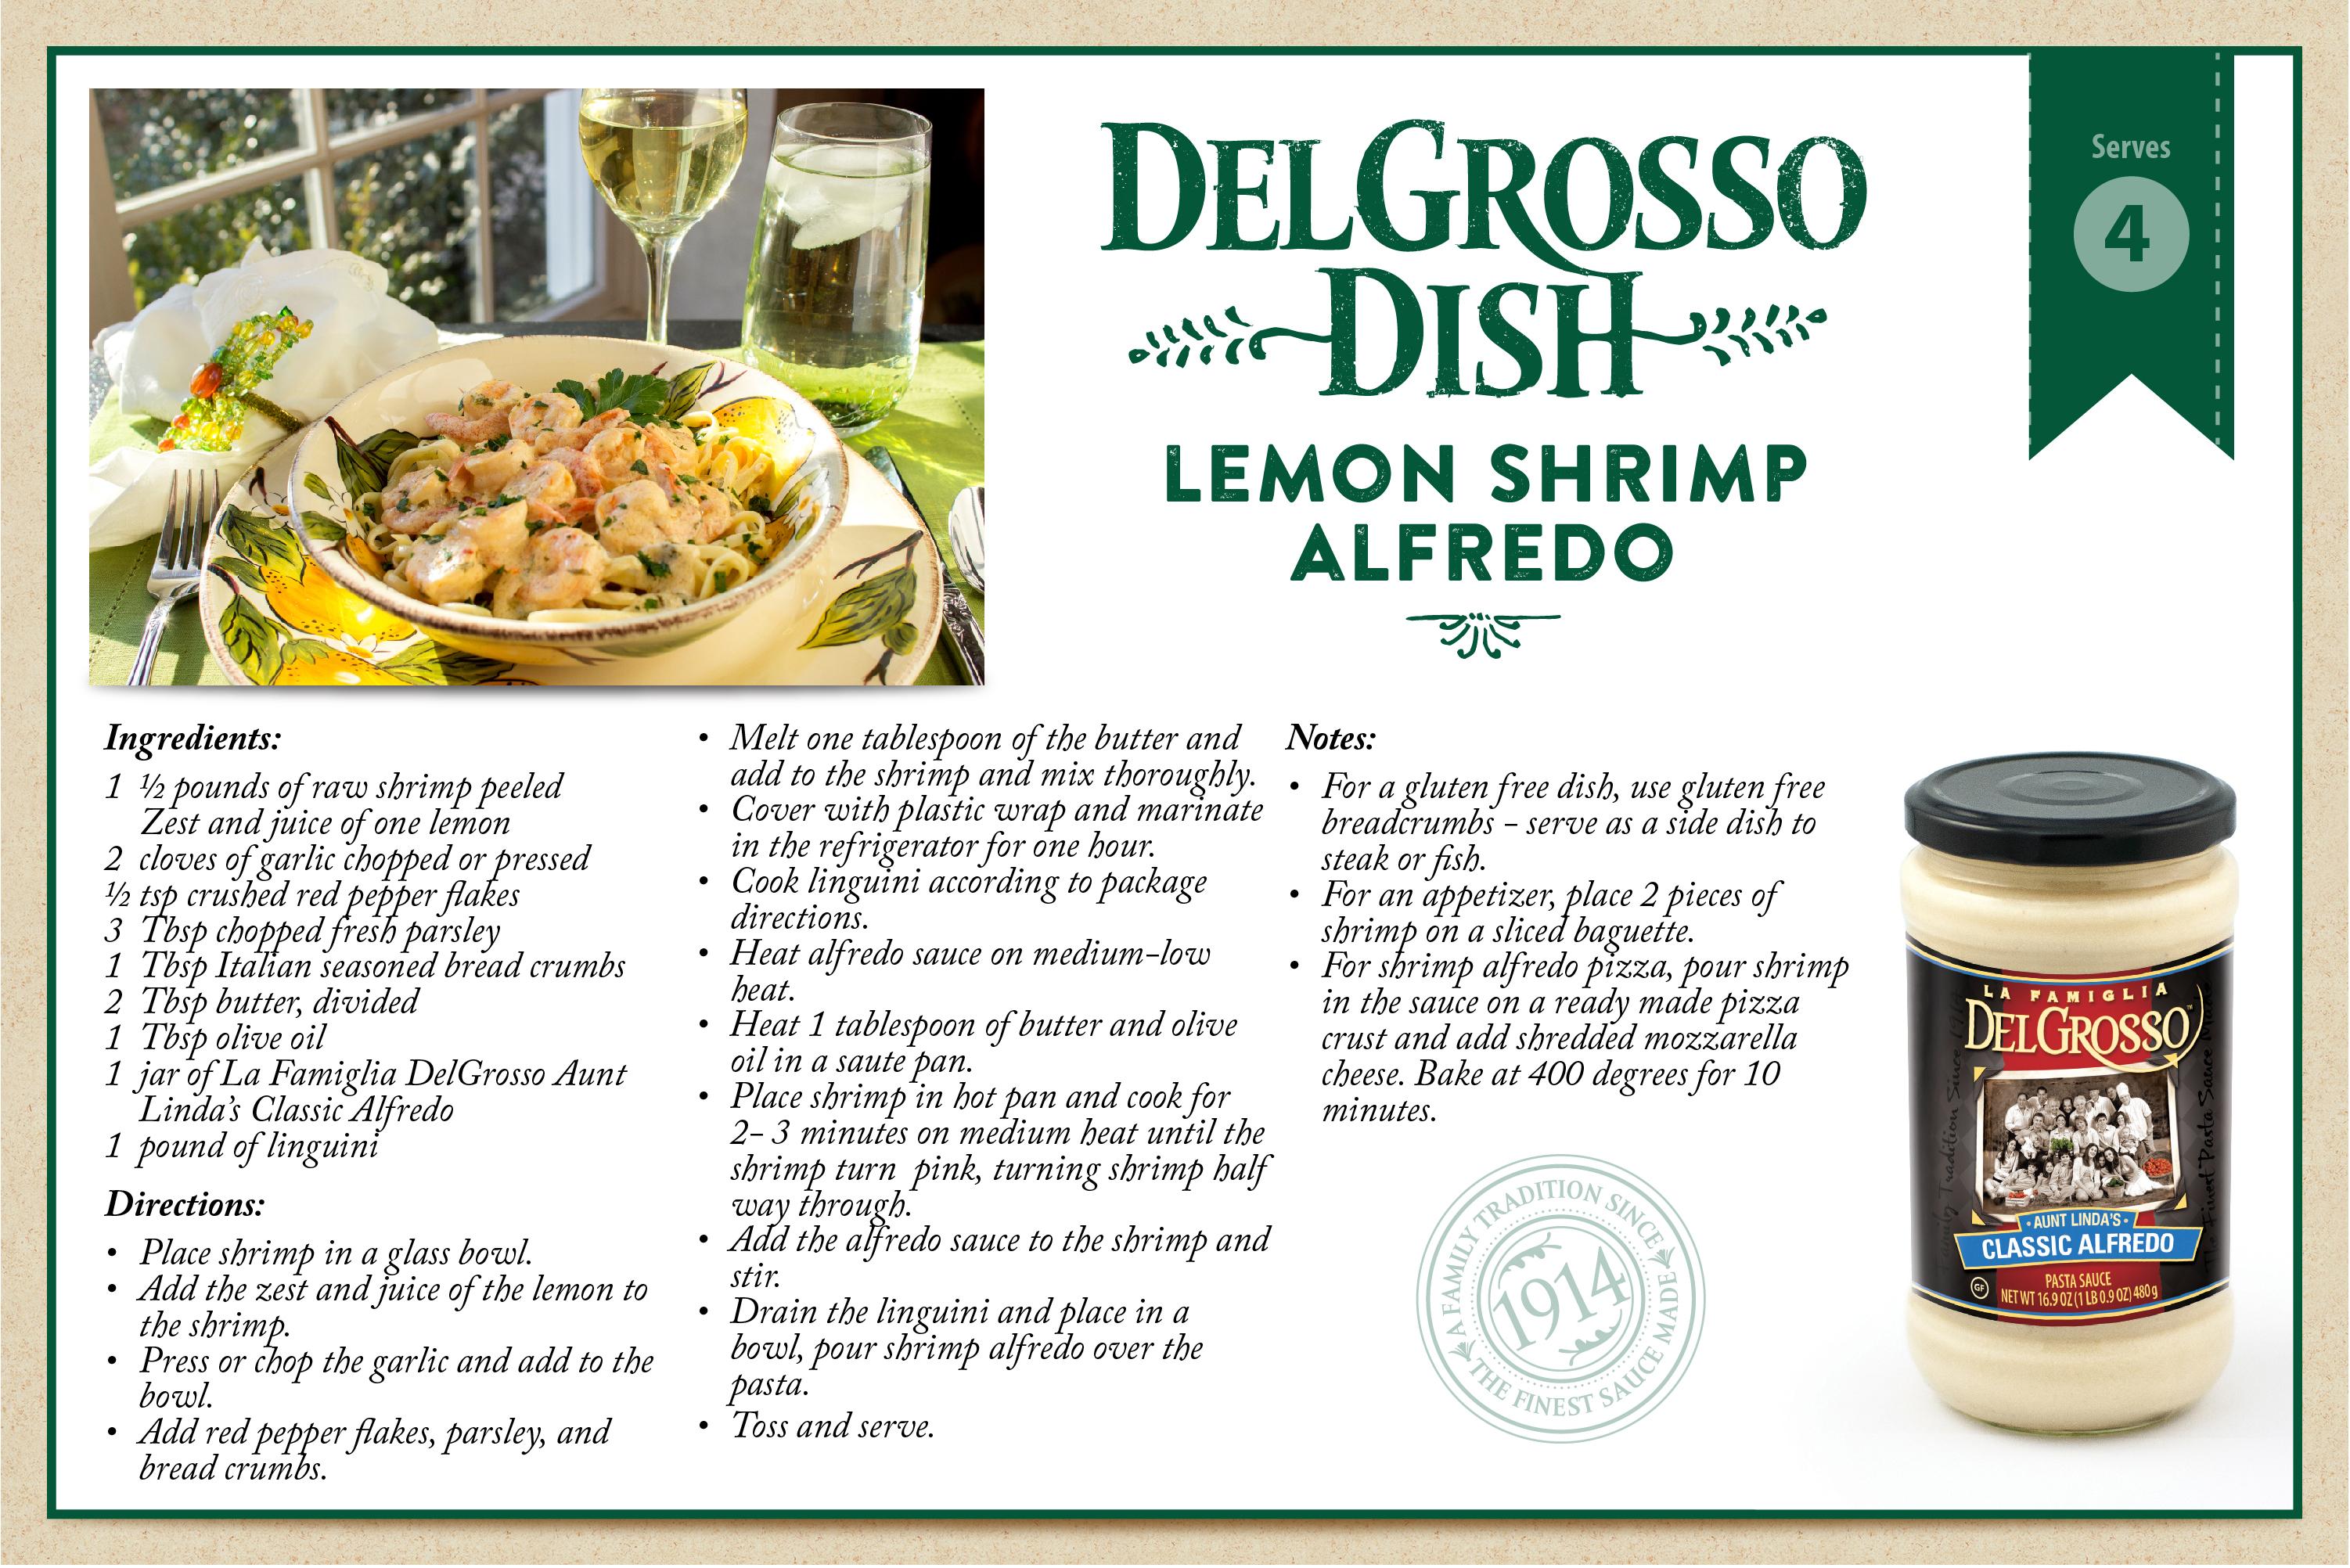 Lemon shrimp alfredo delgrosso sauces recipe card forumfinder Images